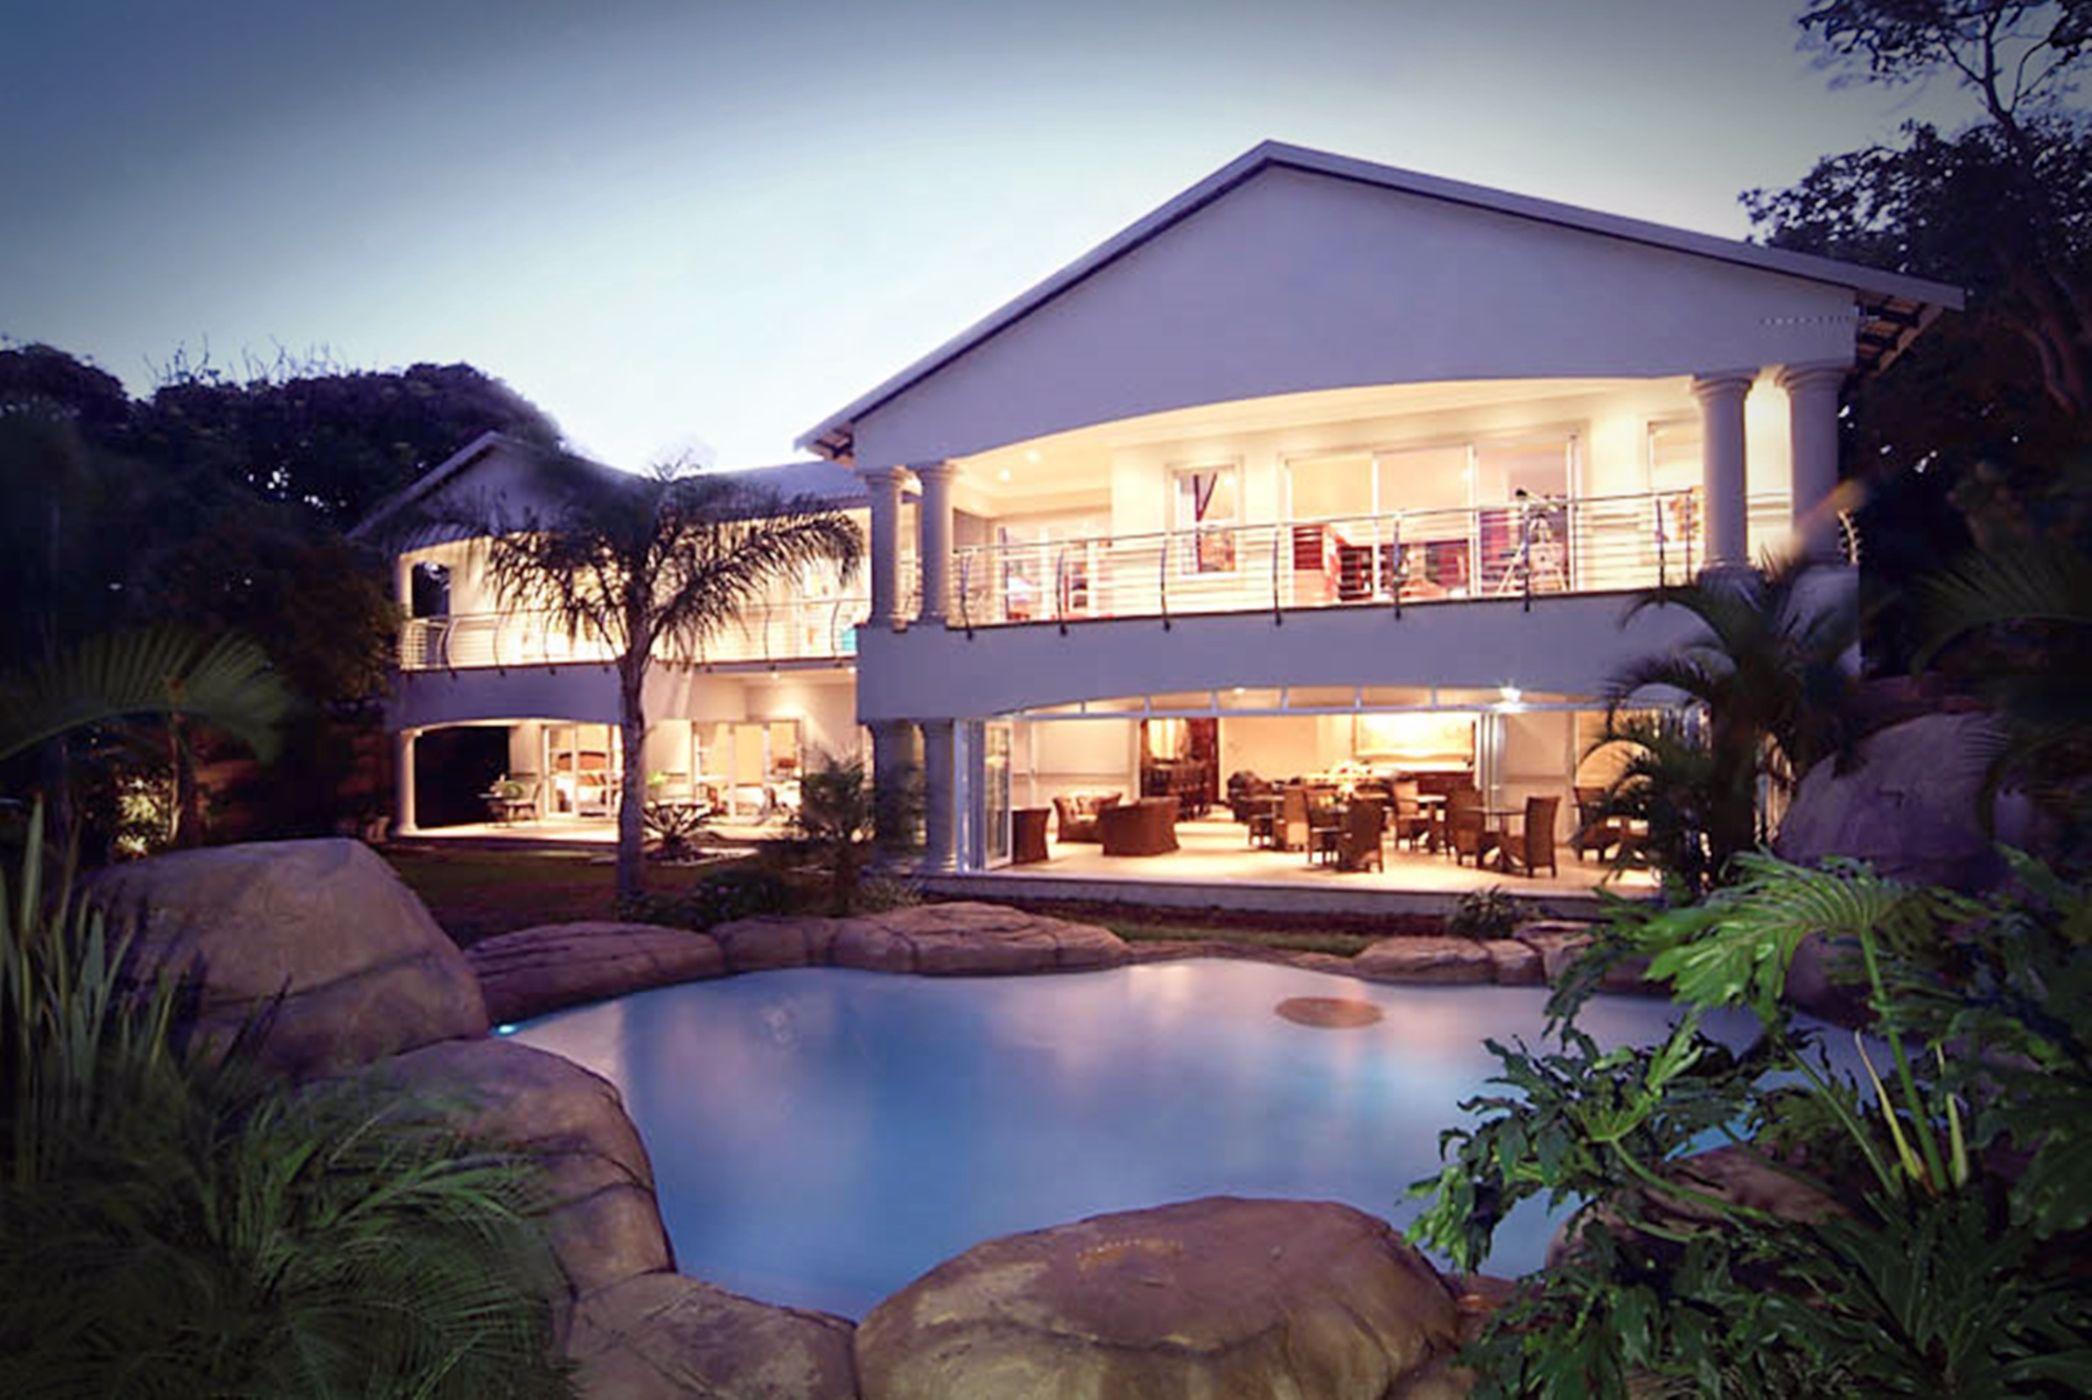 10 bedroom house for sale in uMhlanga Rocks